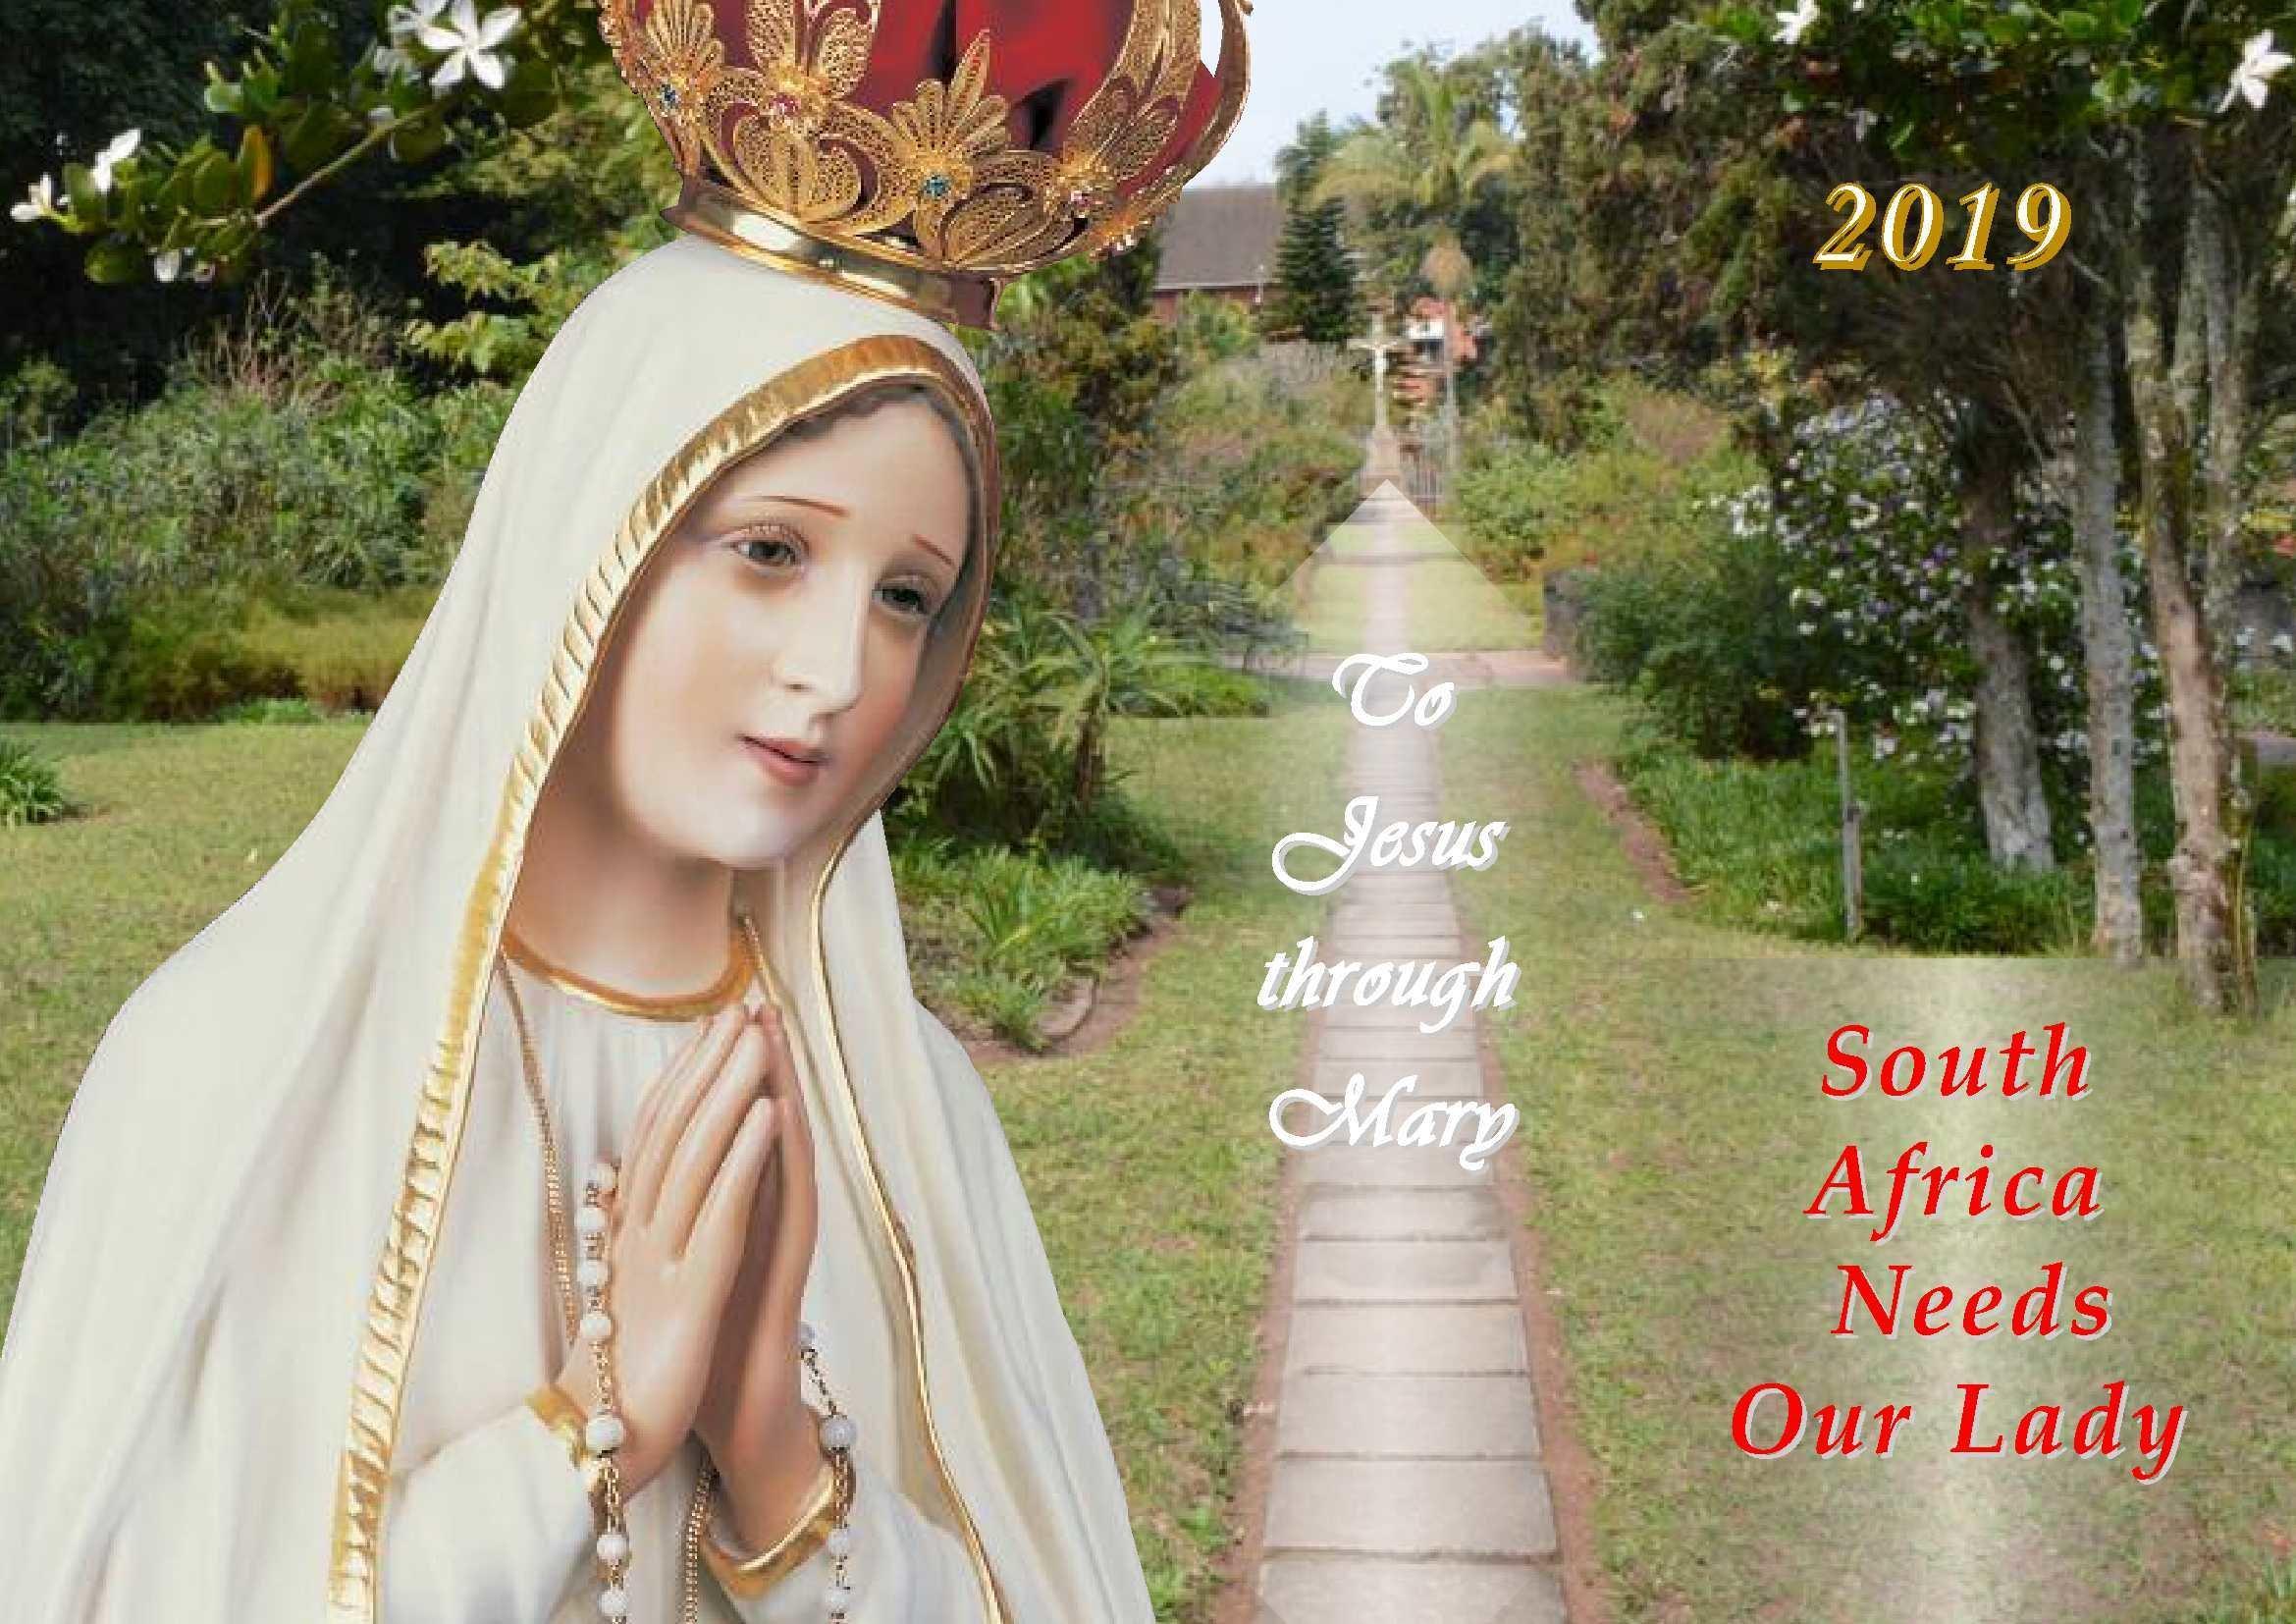 2019 Marian Calendar FR19